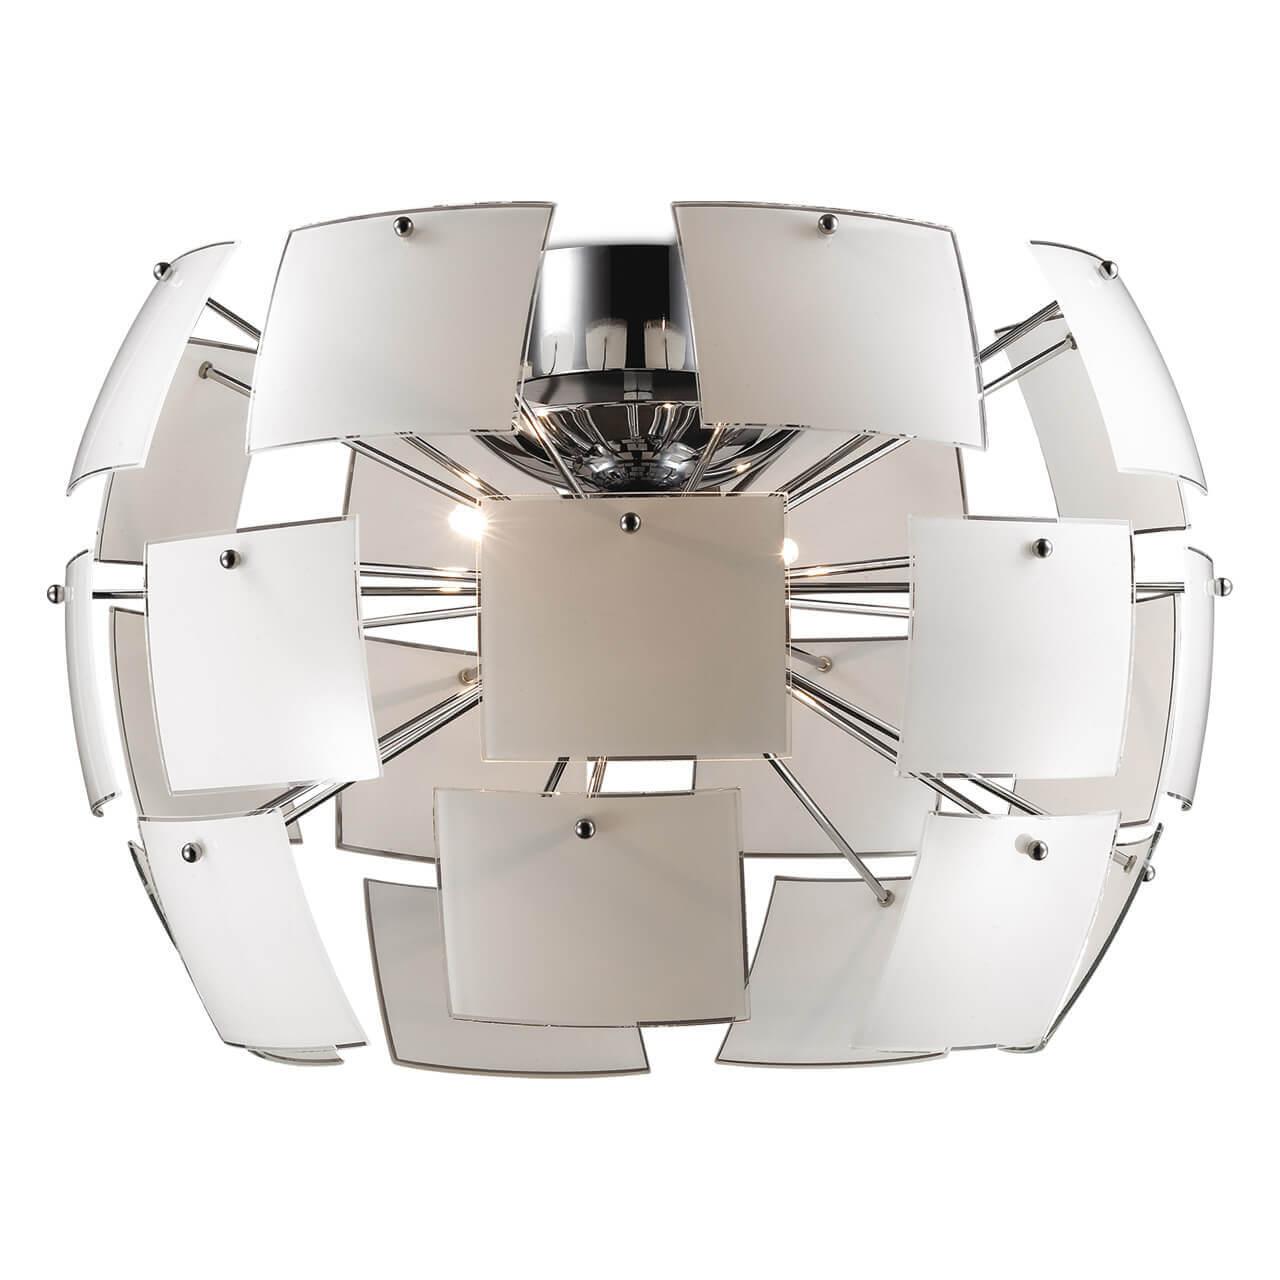 Светильник Odeon Light 2655/4C Classic odeon потолочная люстра odeon light crea 2597 4c